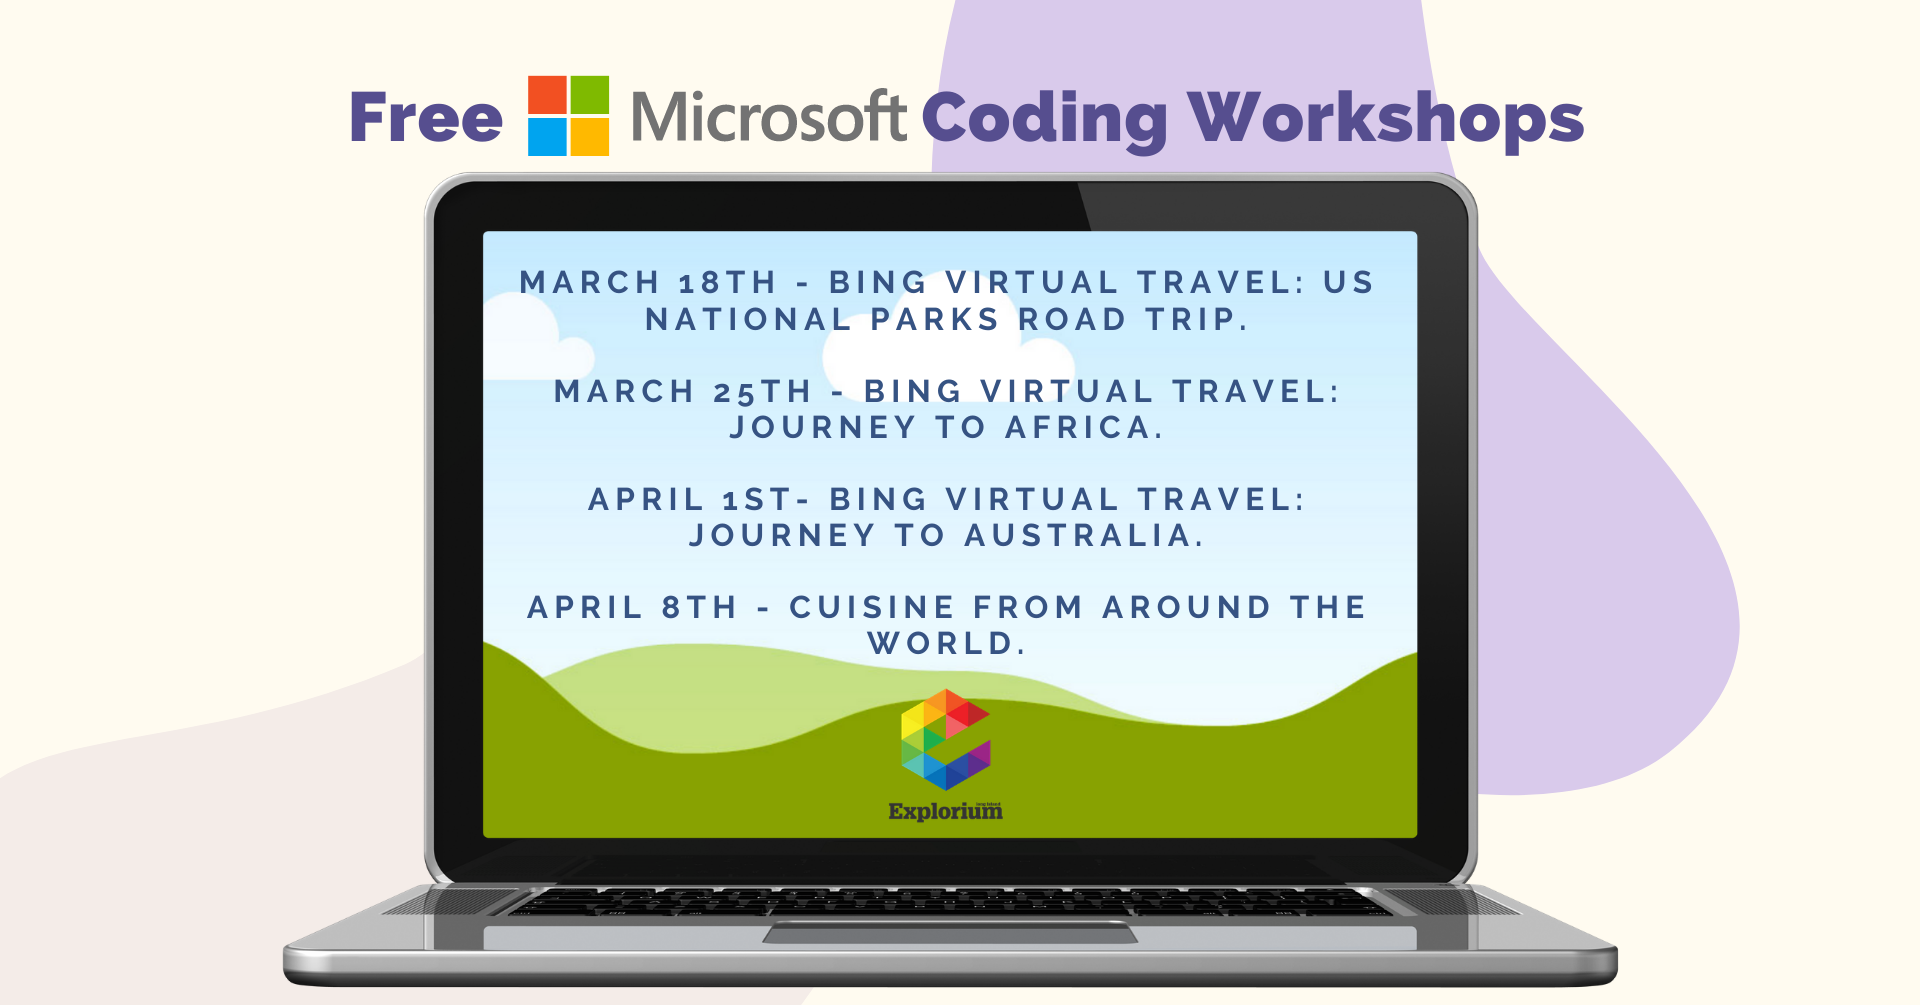 Microsoft Workshops All